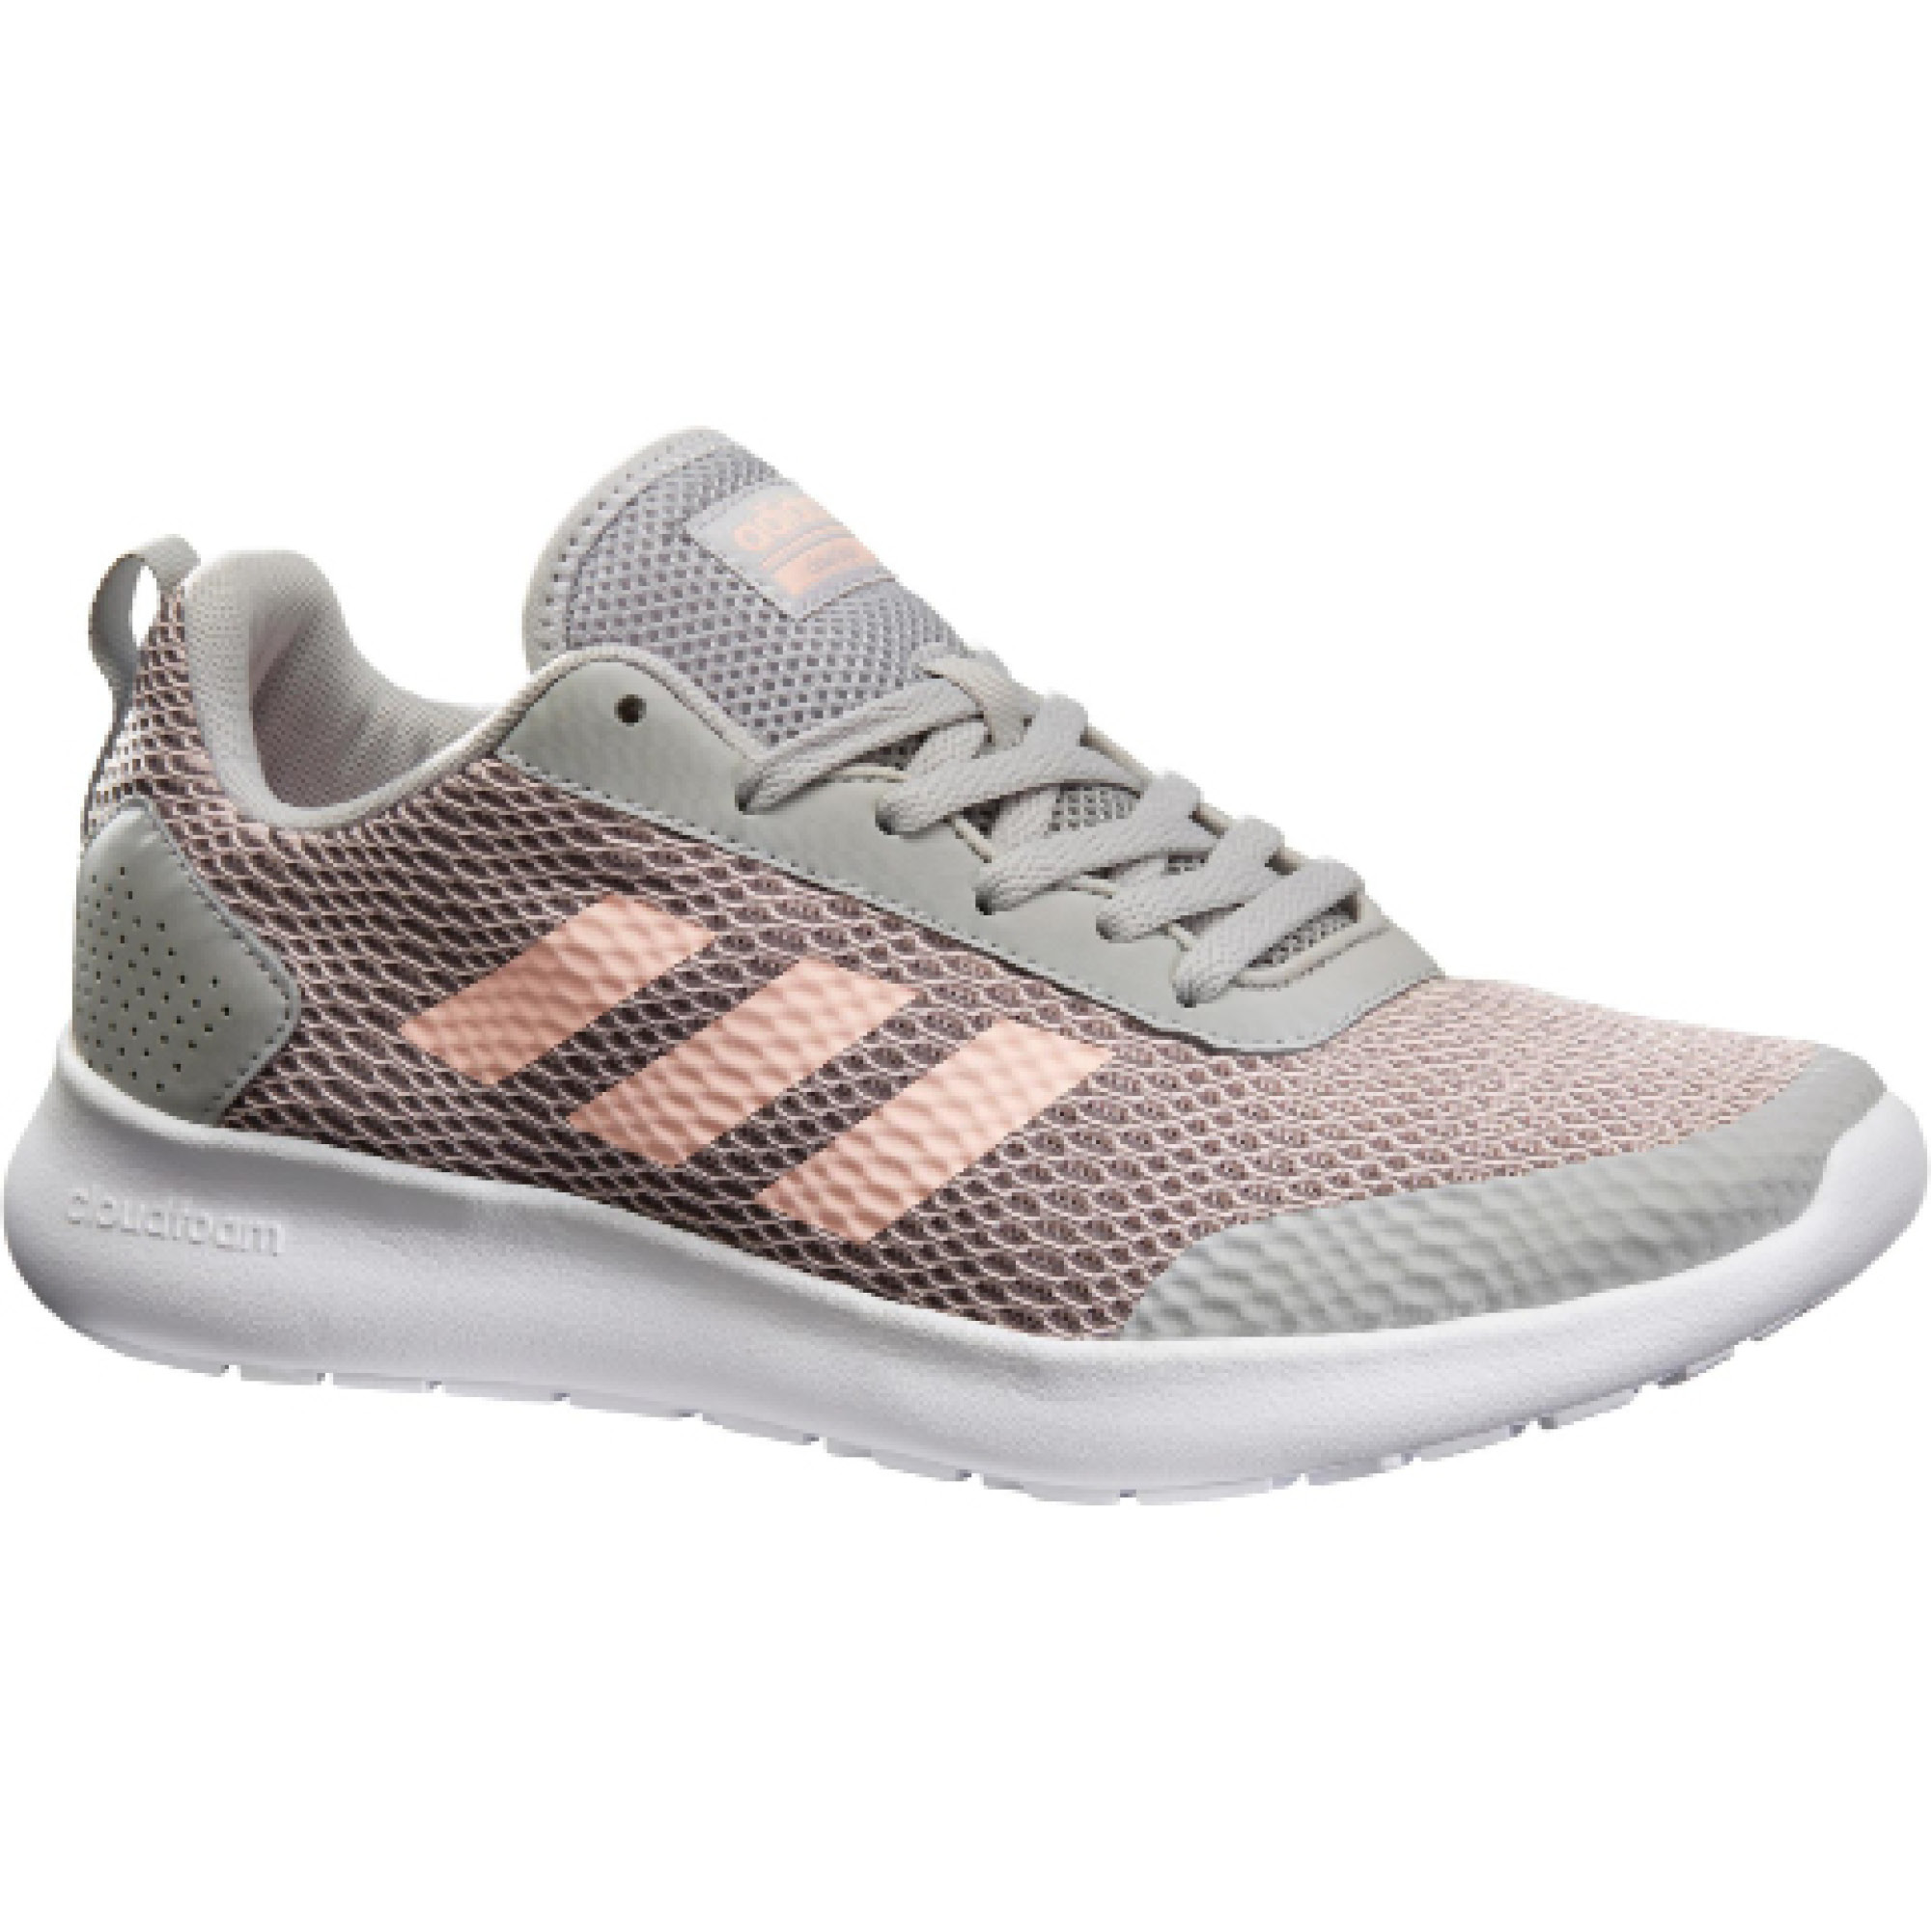 Adidas Damessneakers CF Element Race grijs-roze